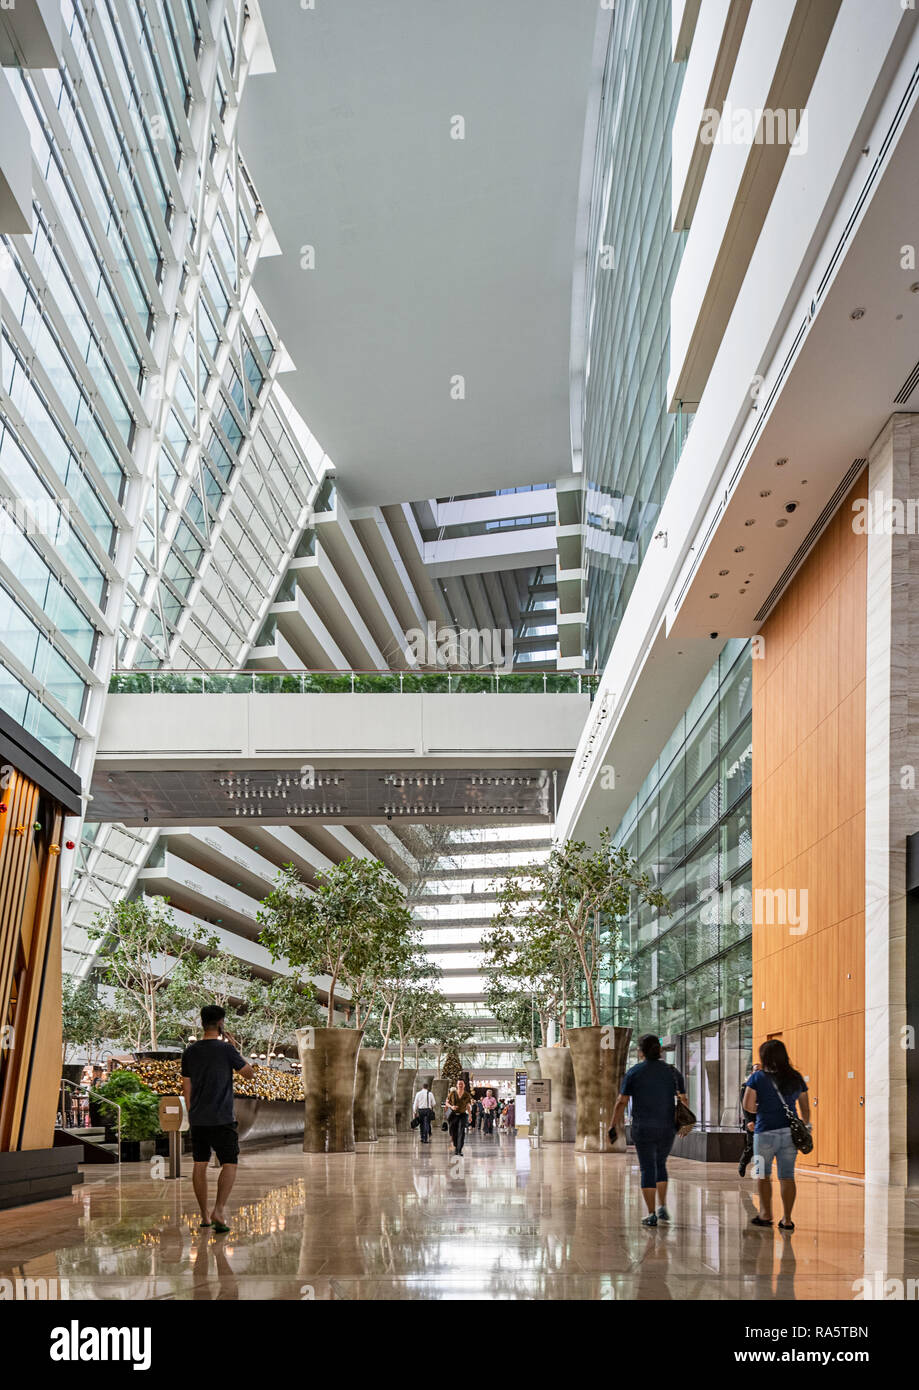 Marina Bay Sands Hotel Interior - Stock Image